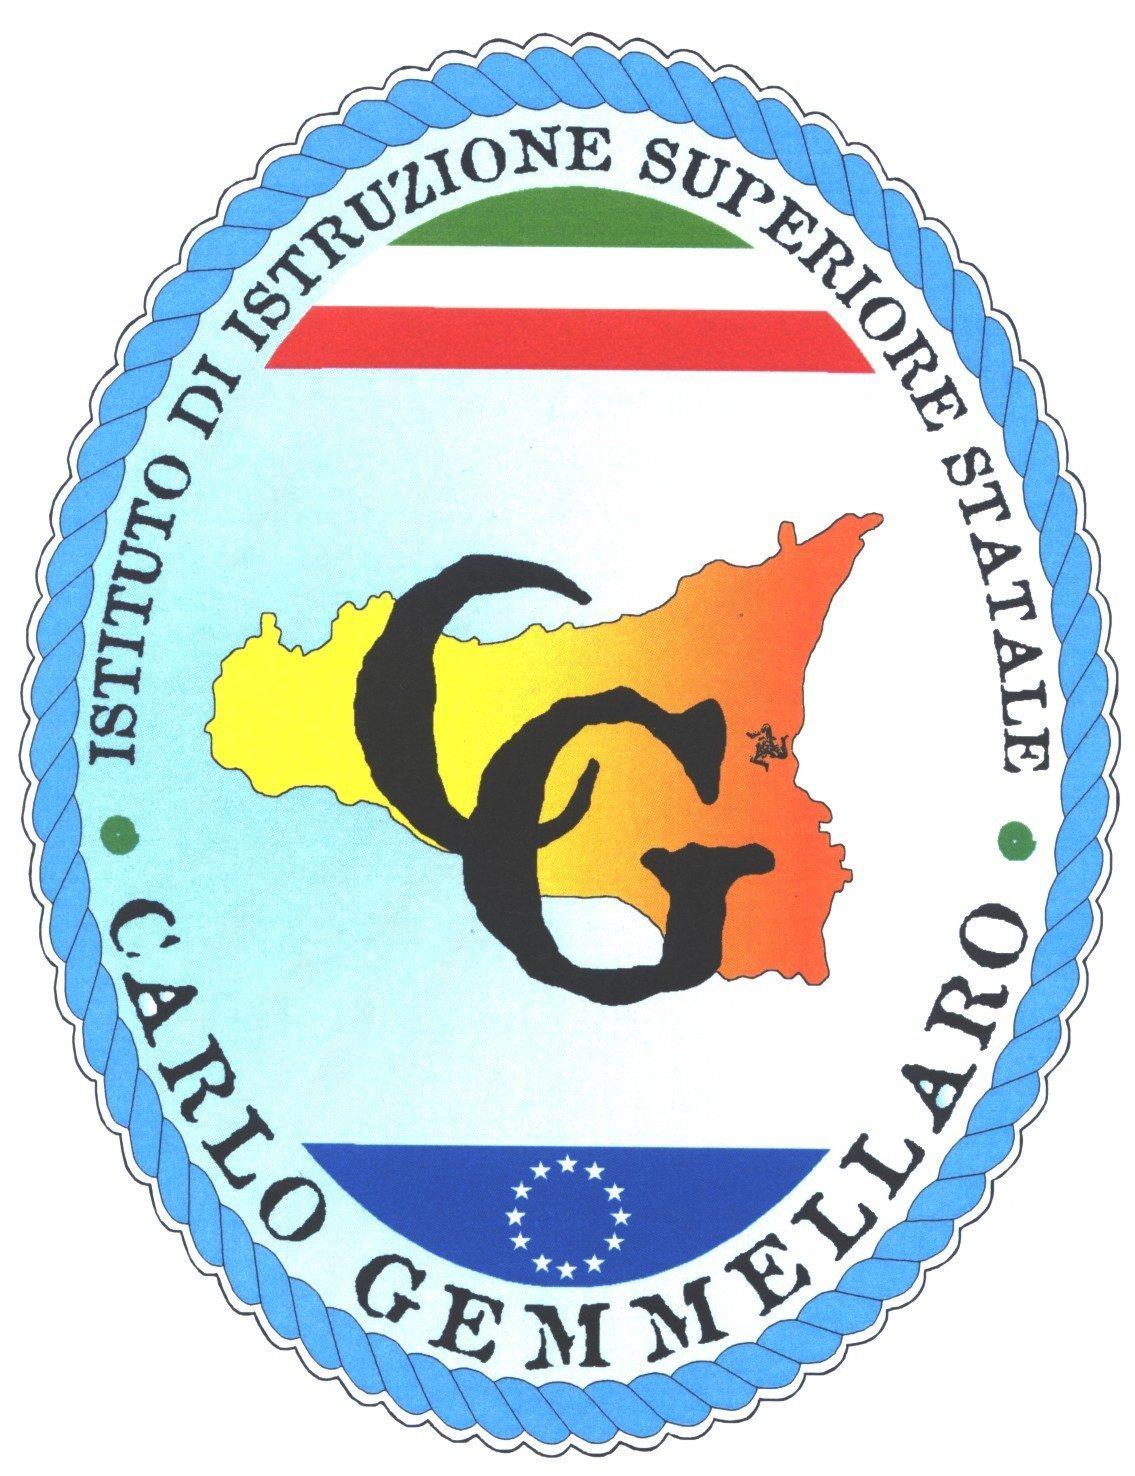 Carlo Gemmellaro – Catania